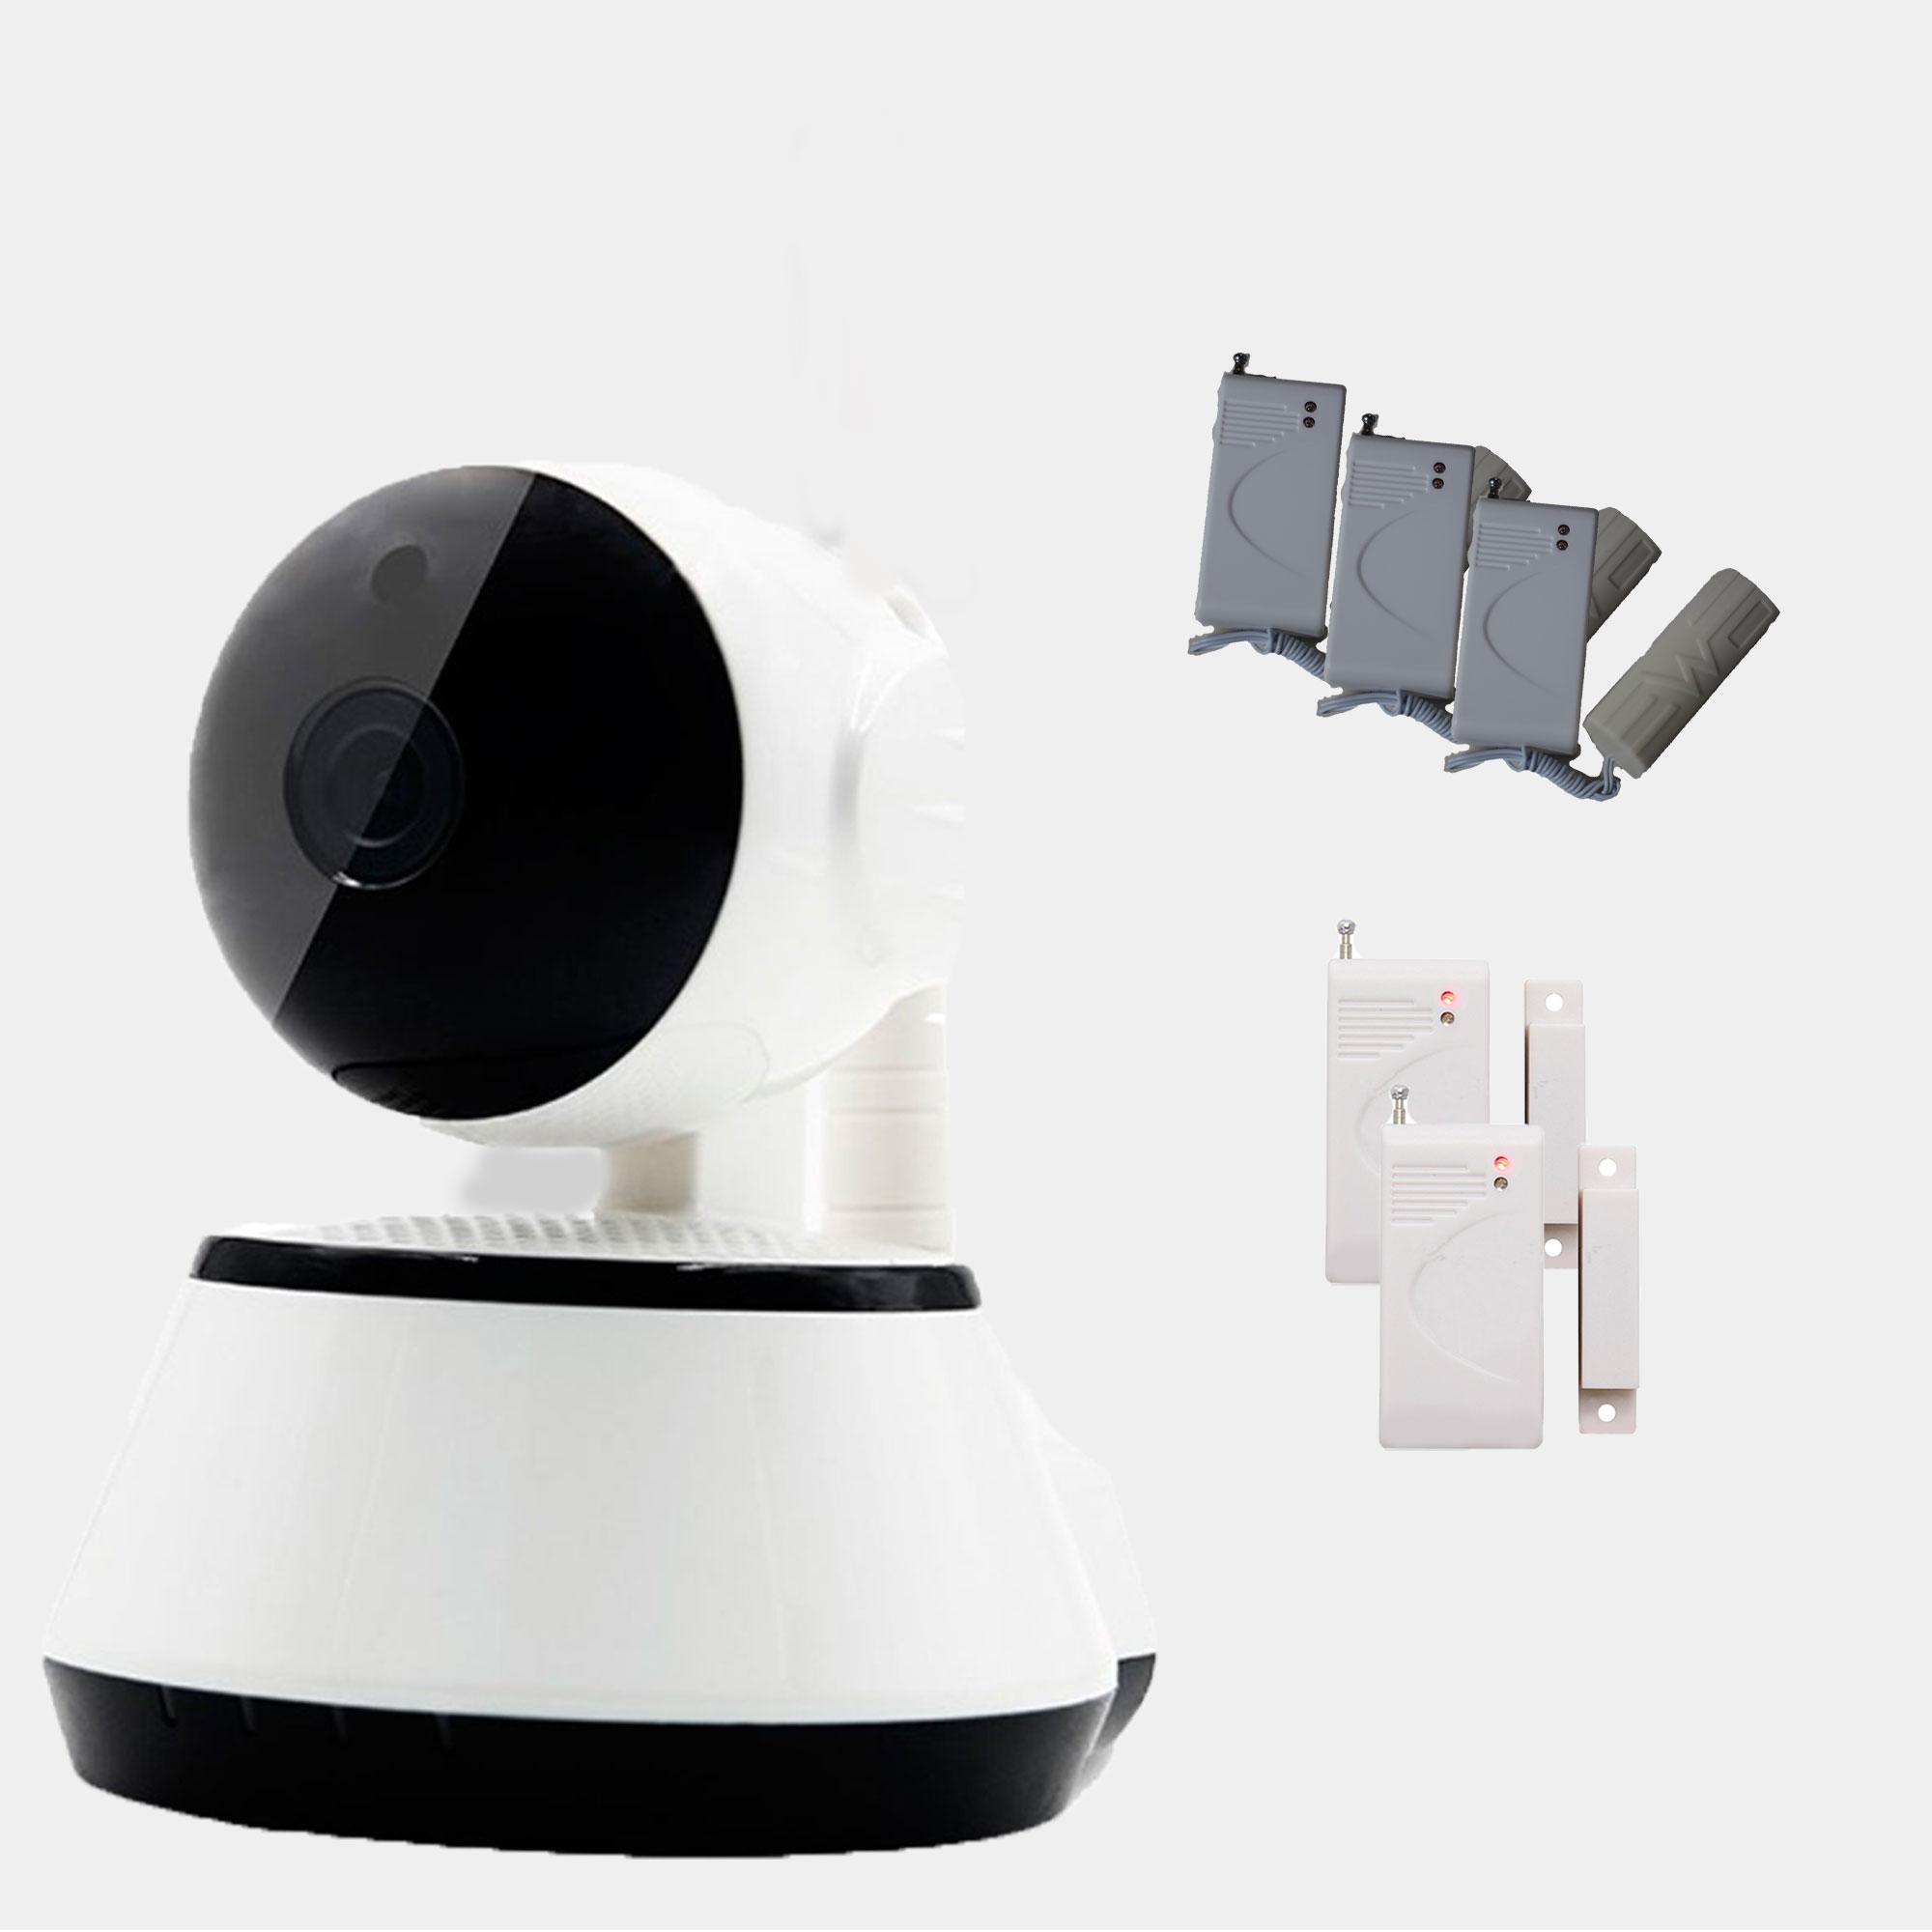 Camara ip wifi vigilancia 2 sensor puerta 3 sensor - Camaras de vigilancia ip wifi ...